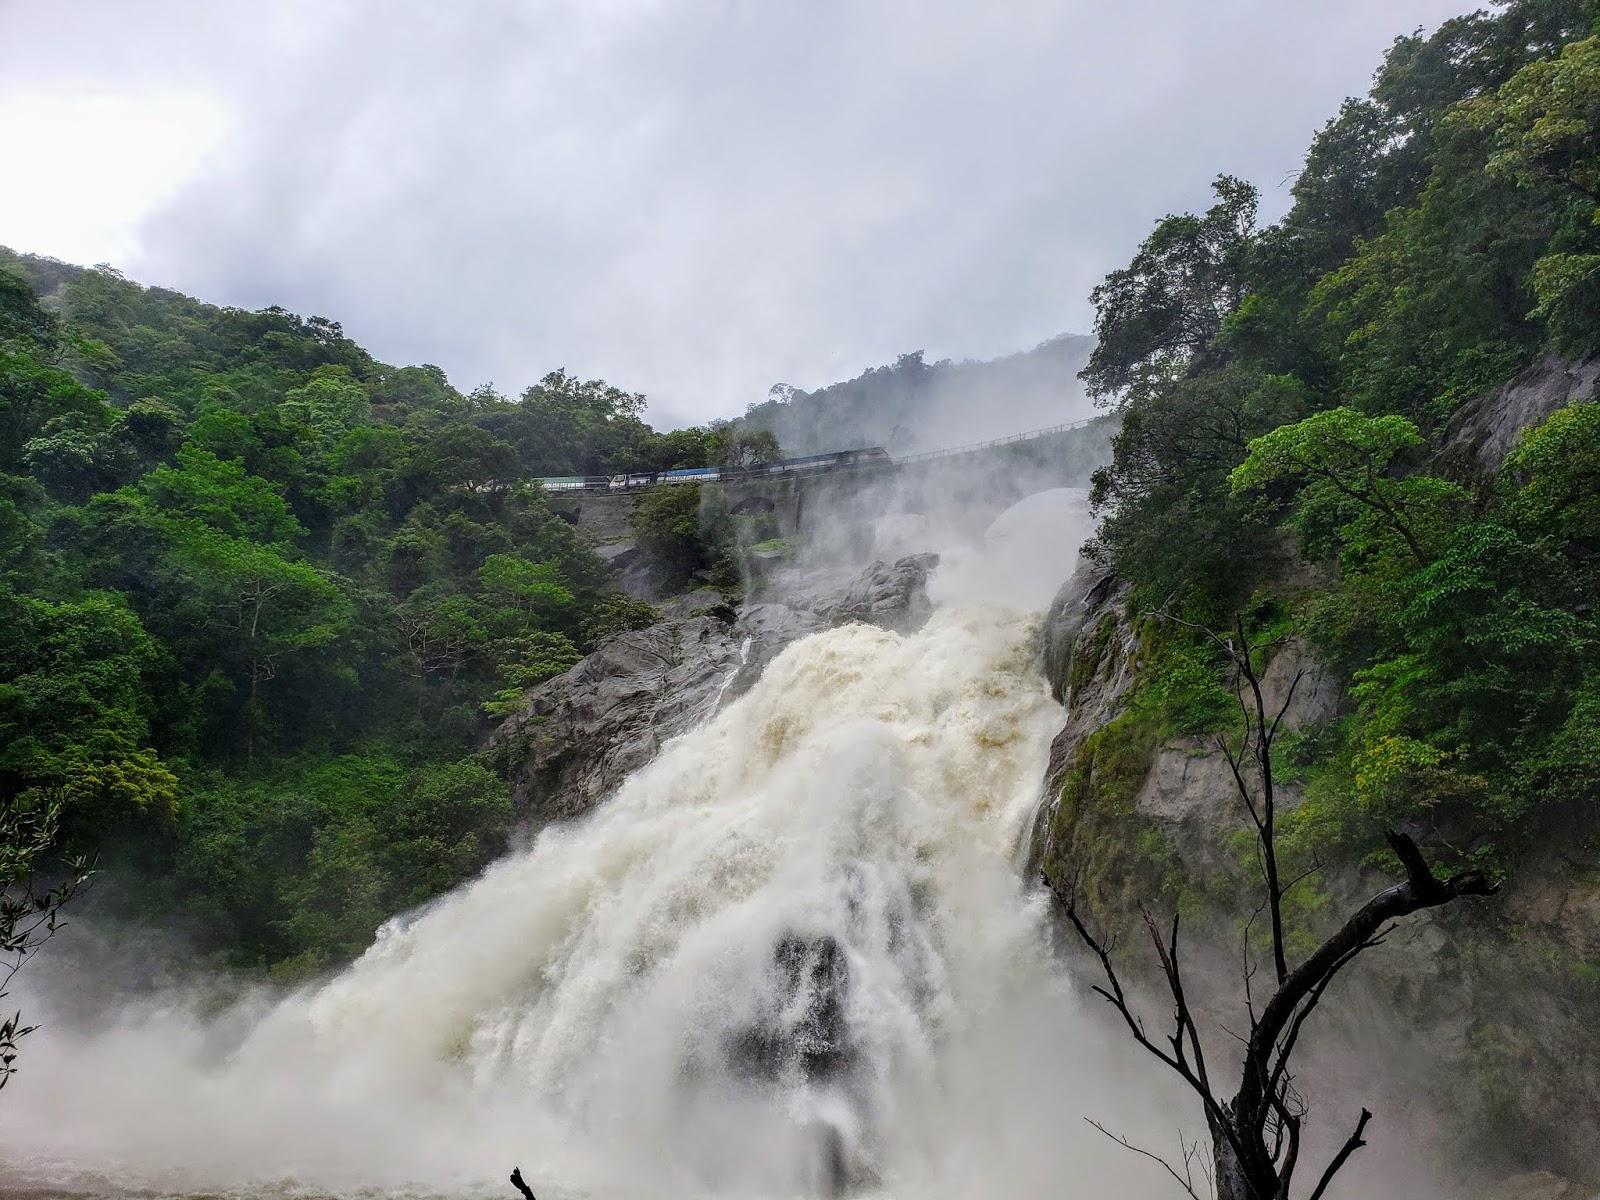 20 kms Trekking At Dudhsagar Falls, Goa In Monsoon Cover